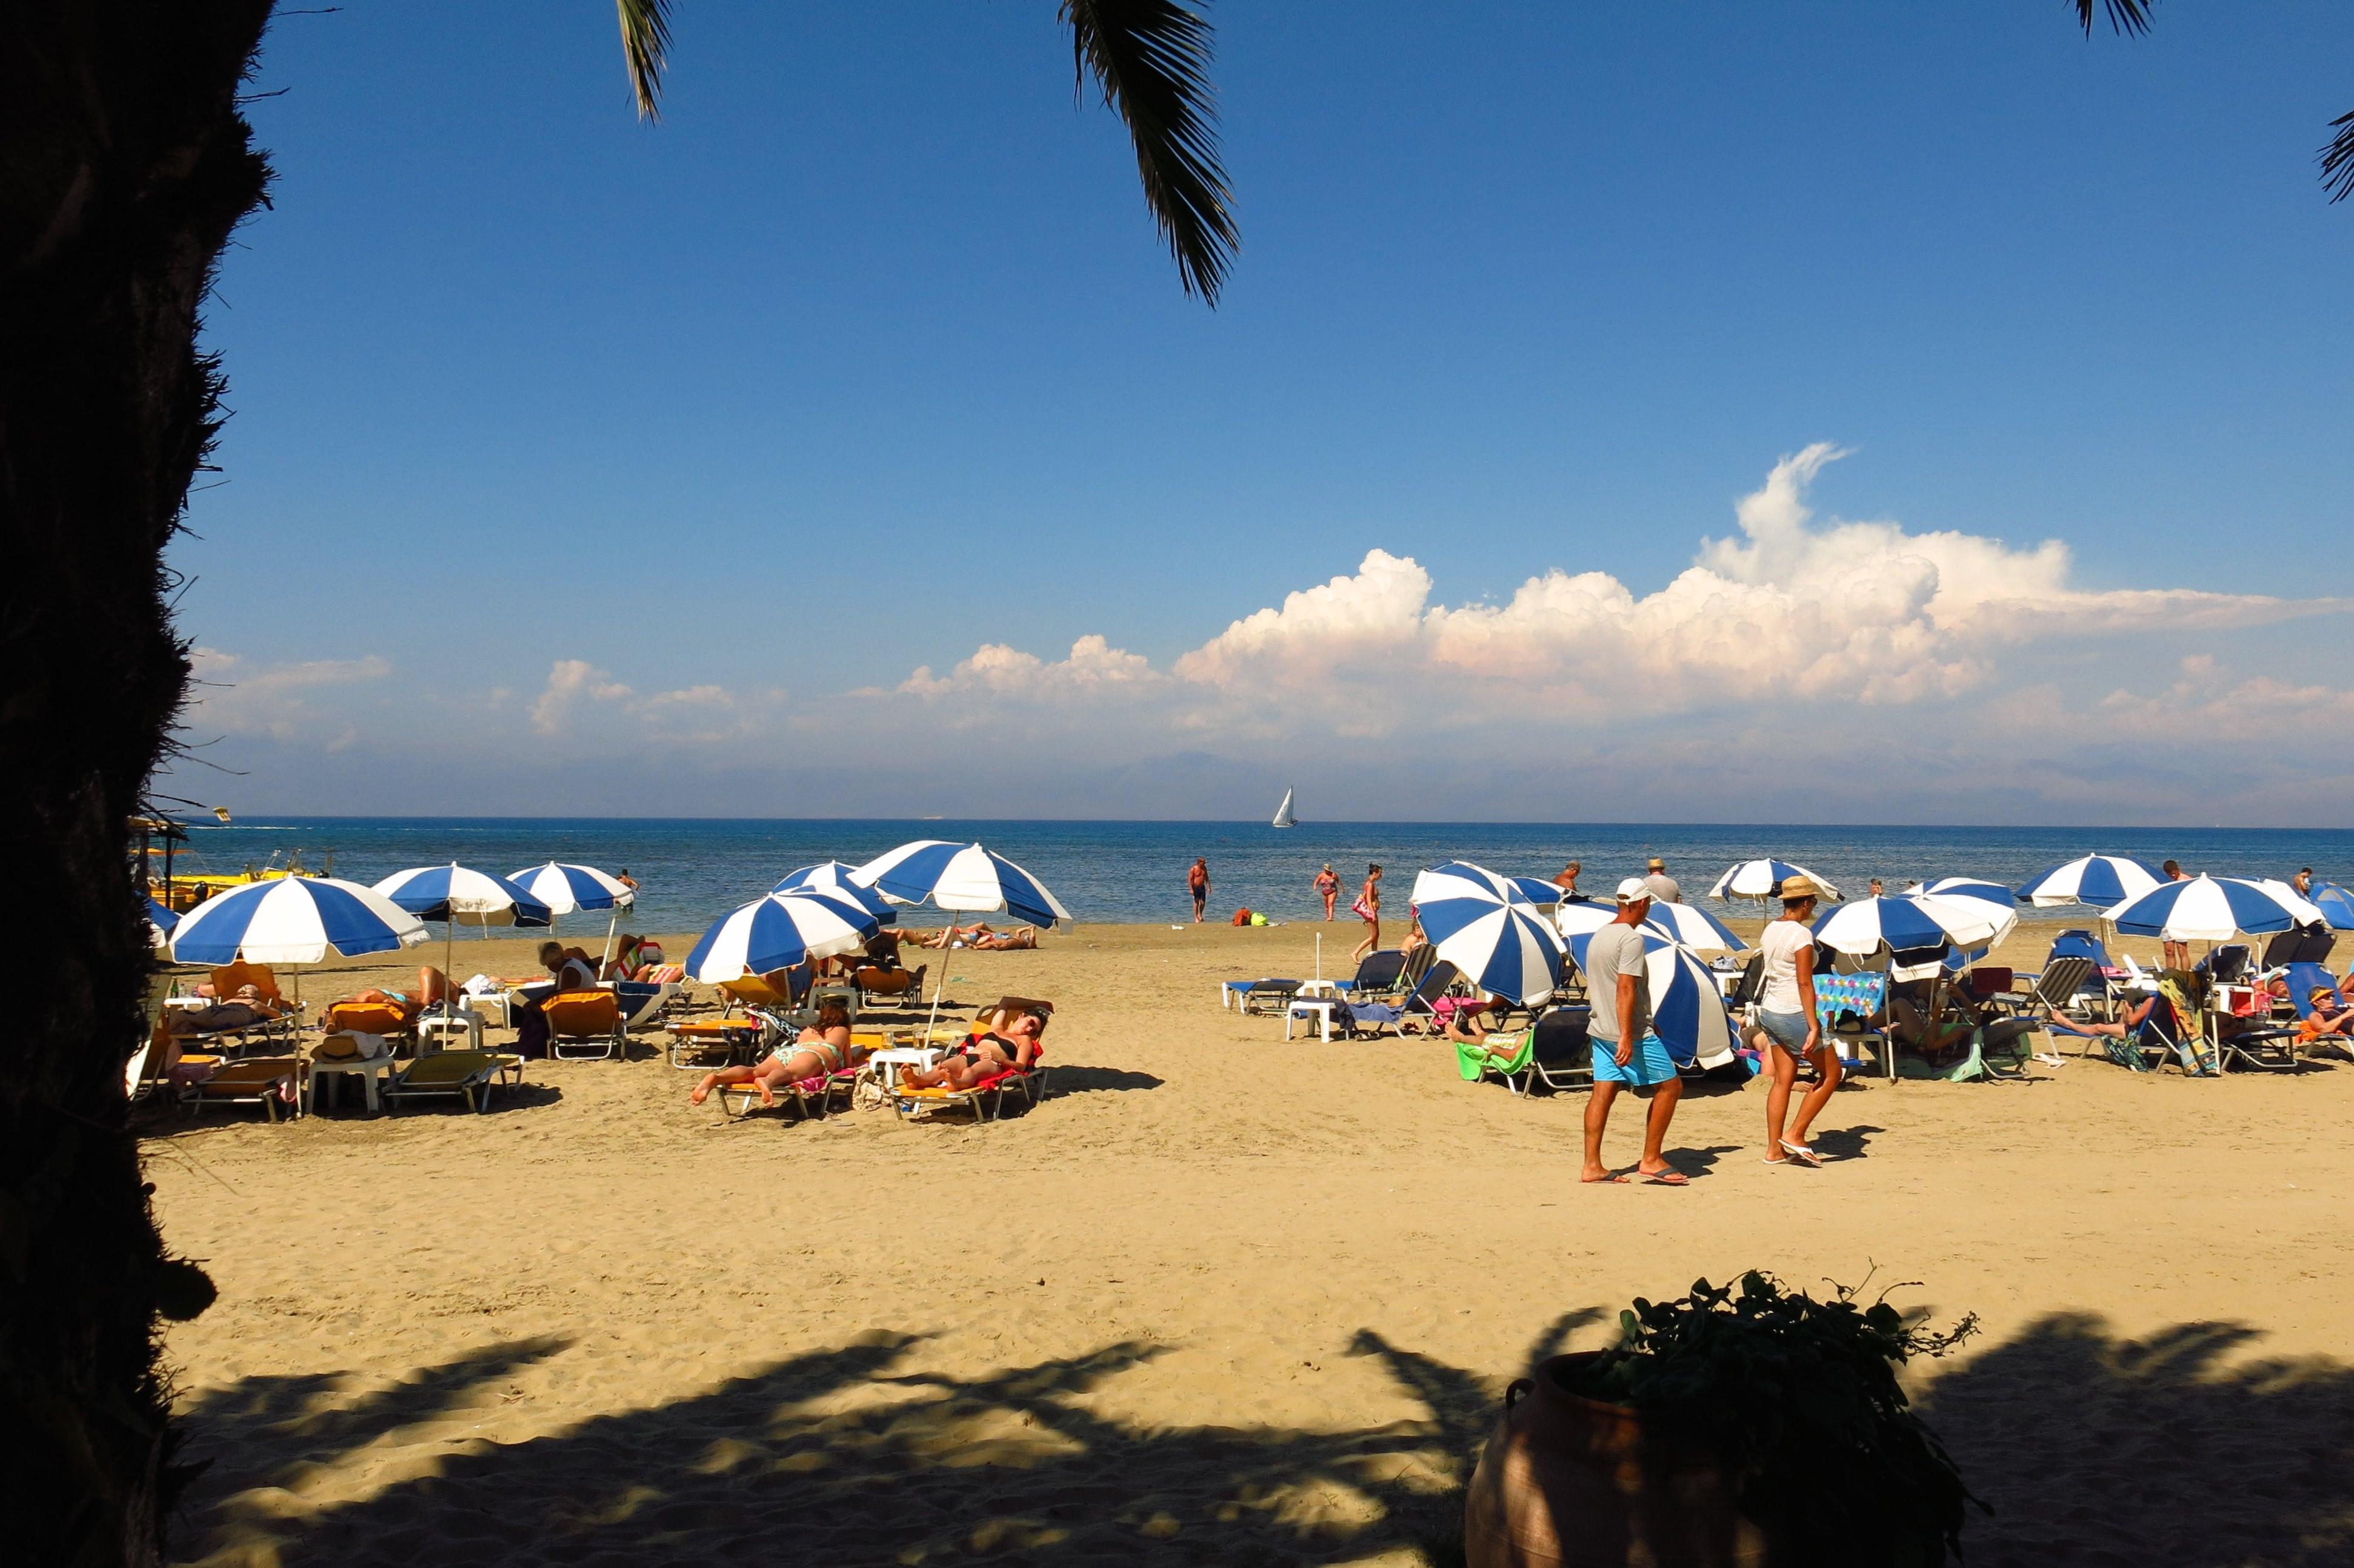 Corfu, Greece - August 31, 2014: Sunbathers relax on Sidari beach on the Greek island of Corfu.